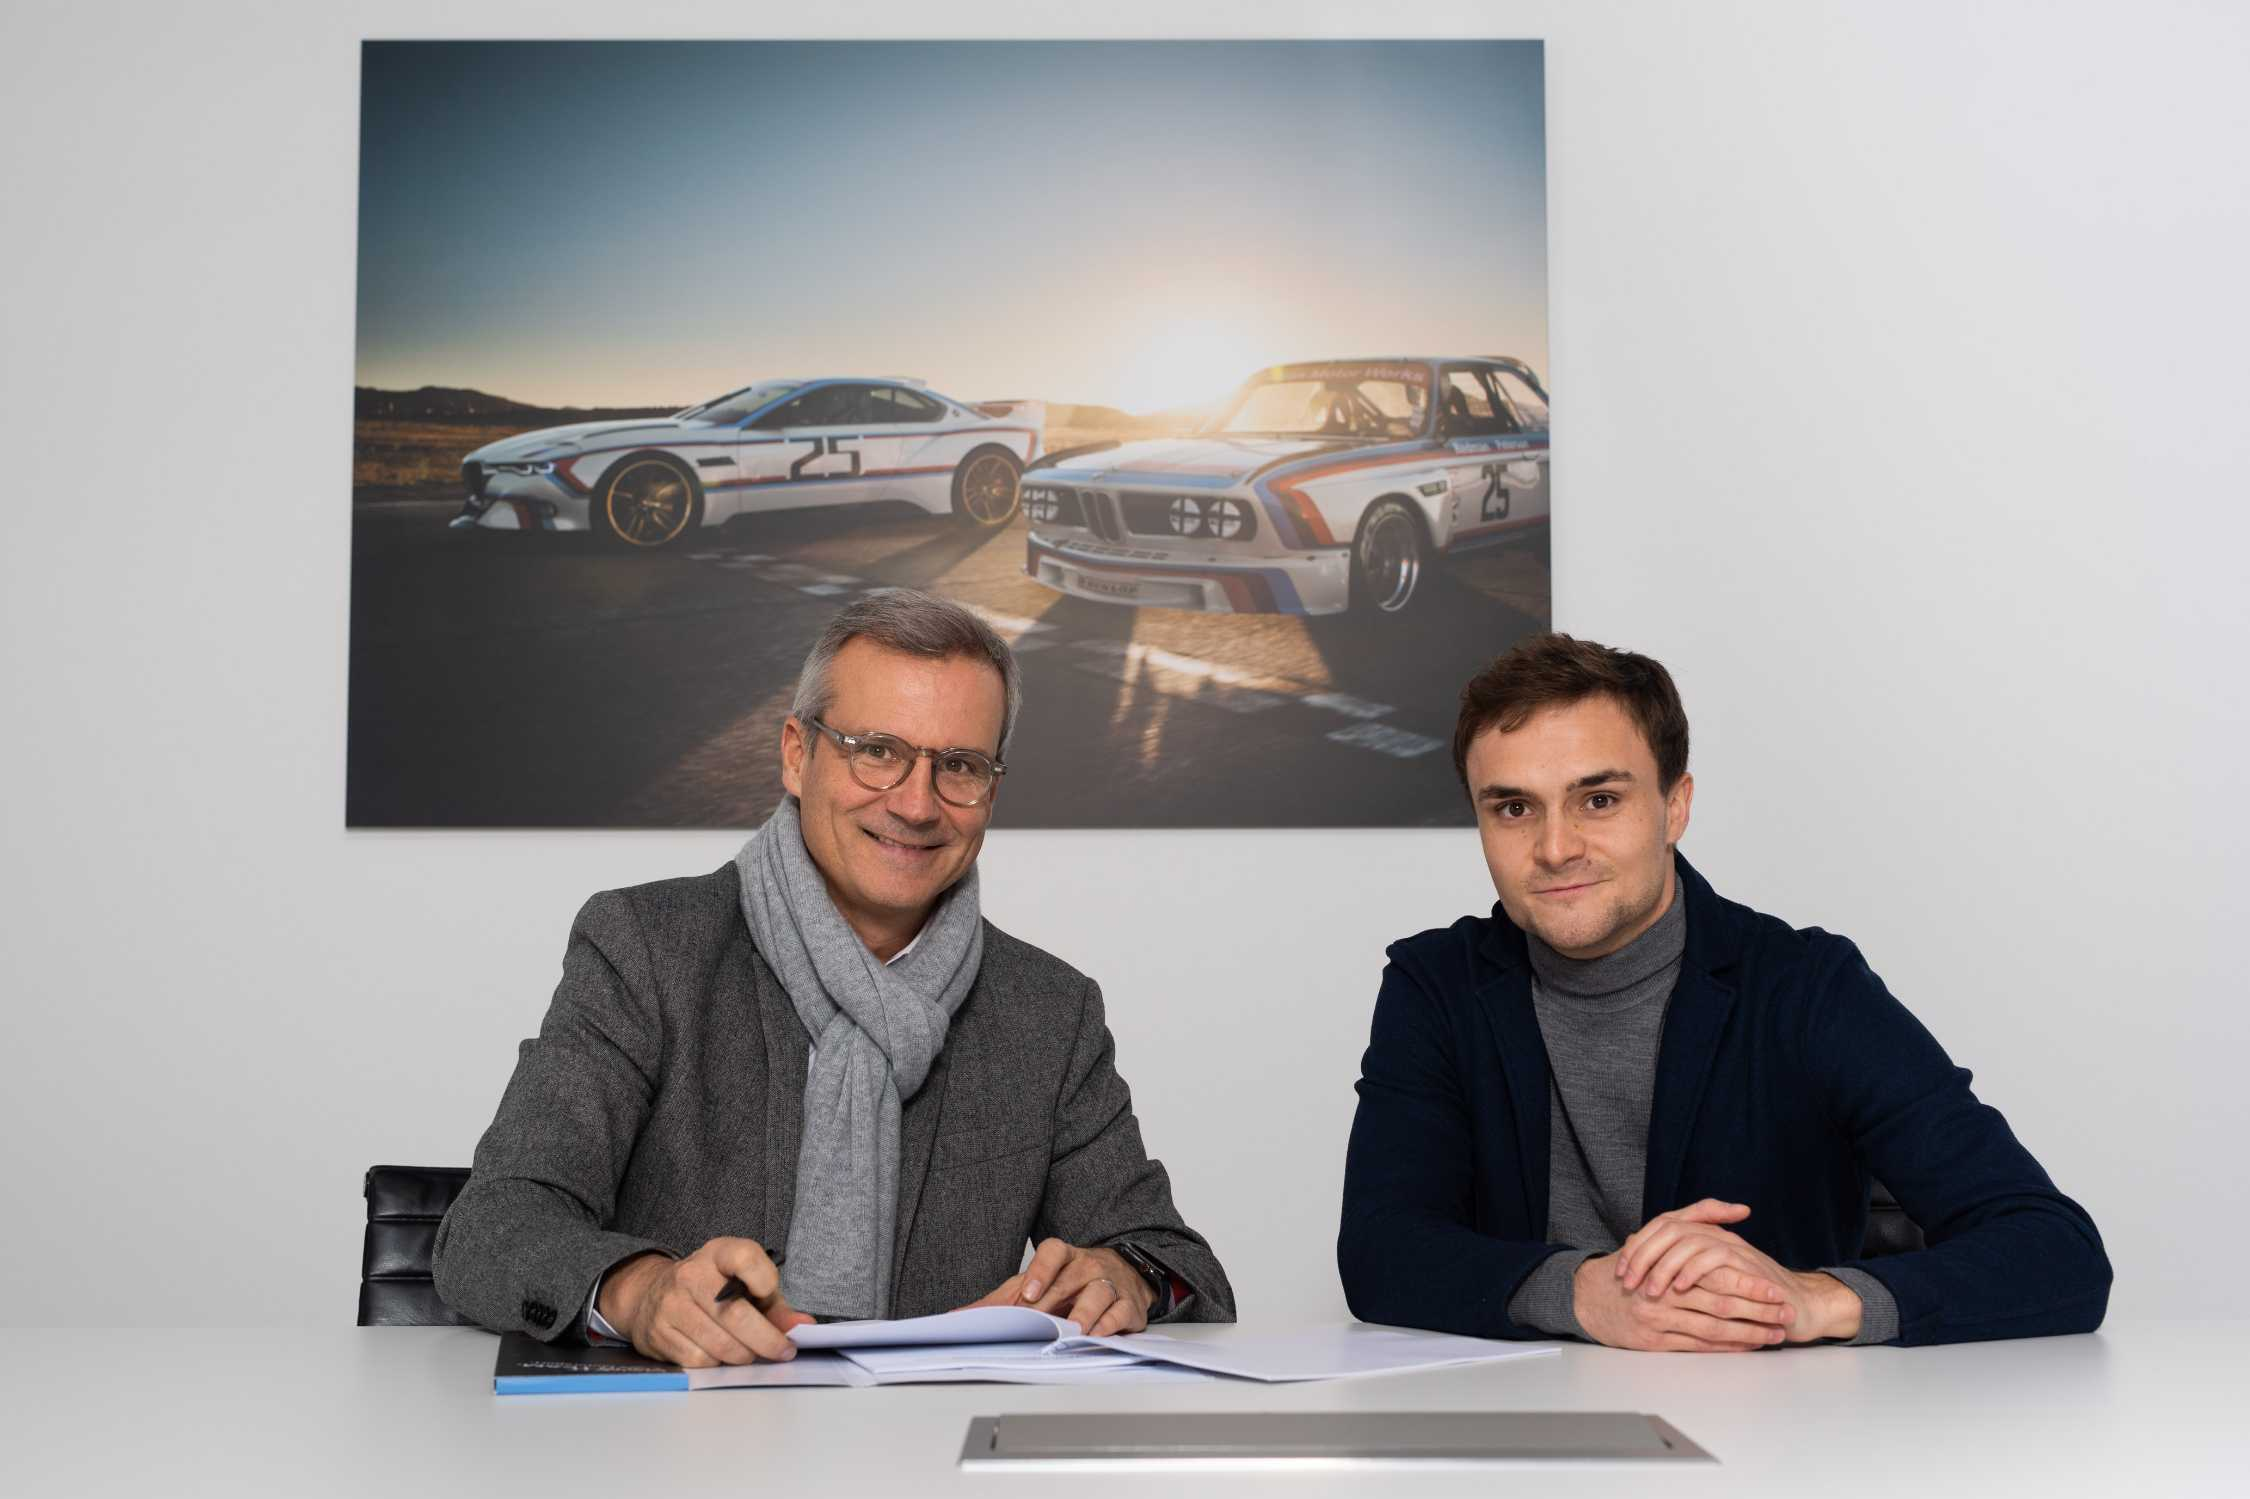 P90379639-munich-ger-18th-december-2019-lucas-auer-jens-marquardt-bmw-motorsport-director-dtm-contract-signing-2250px.jpg